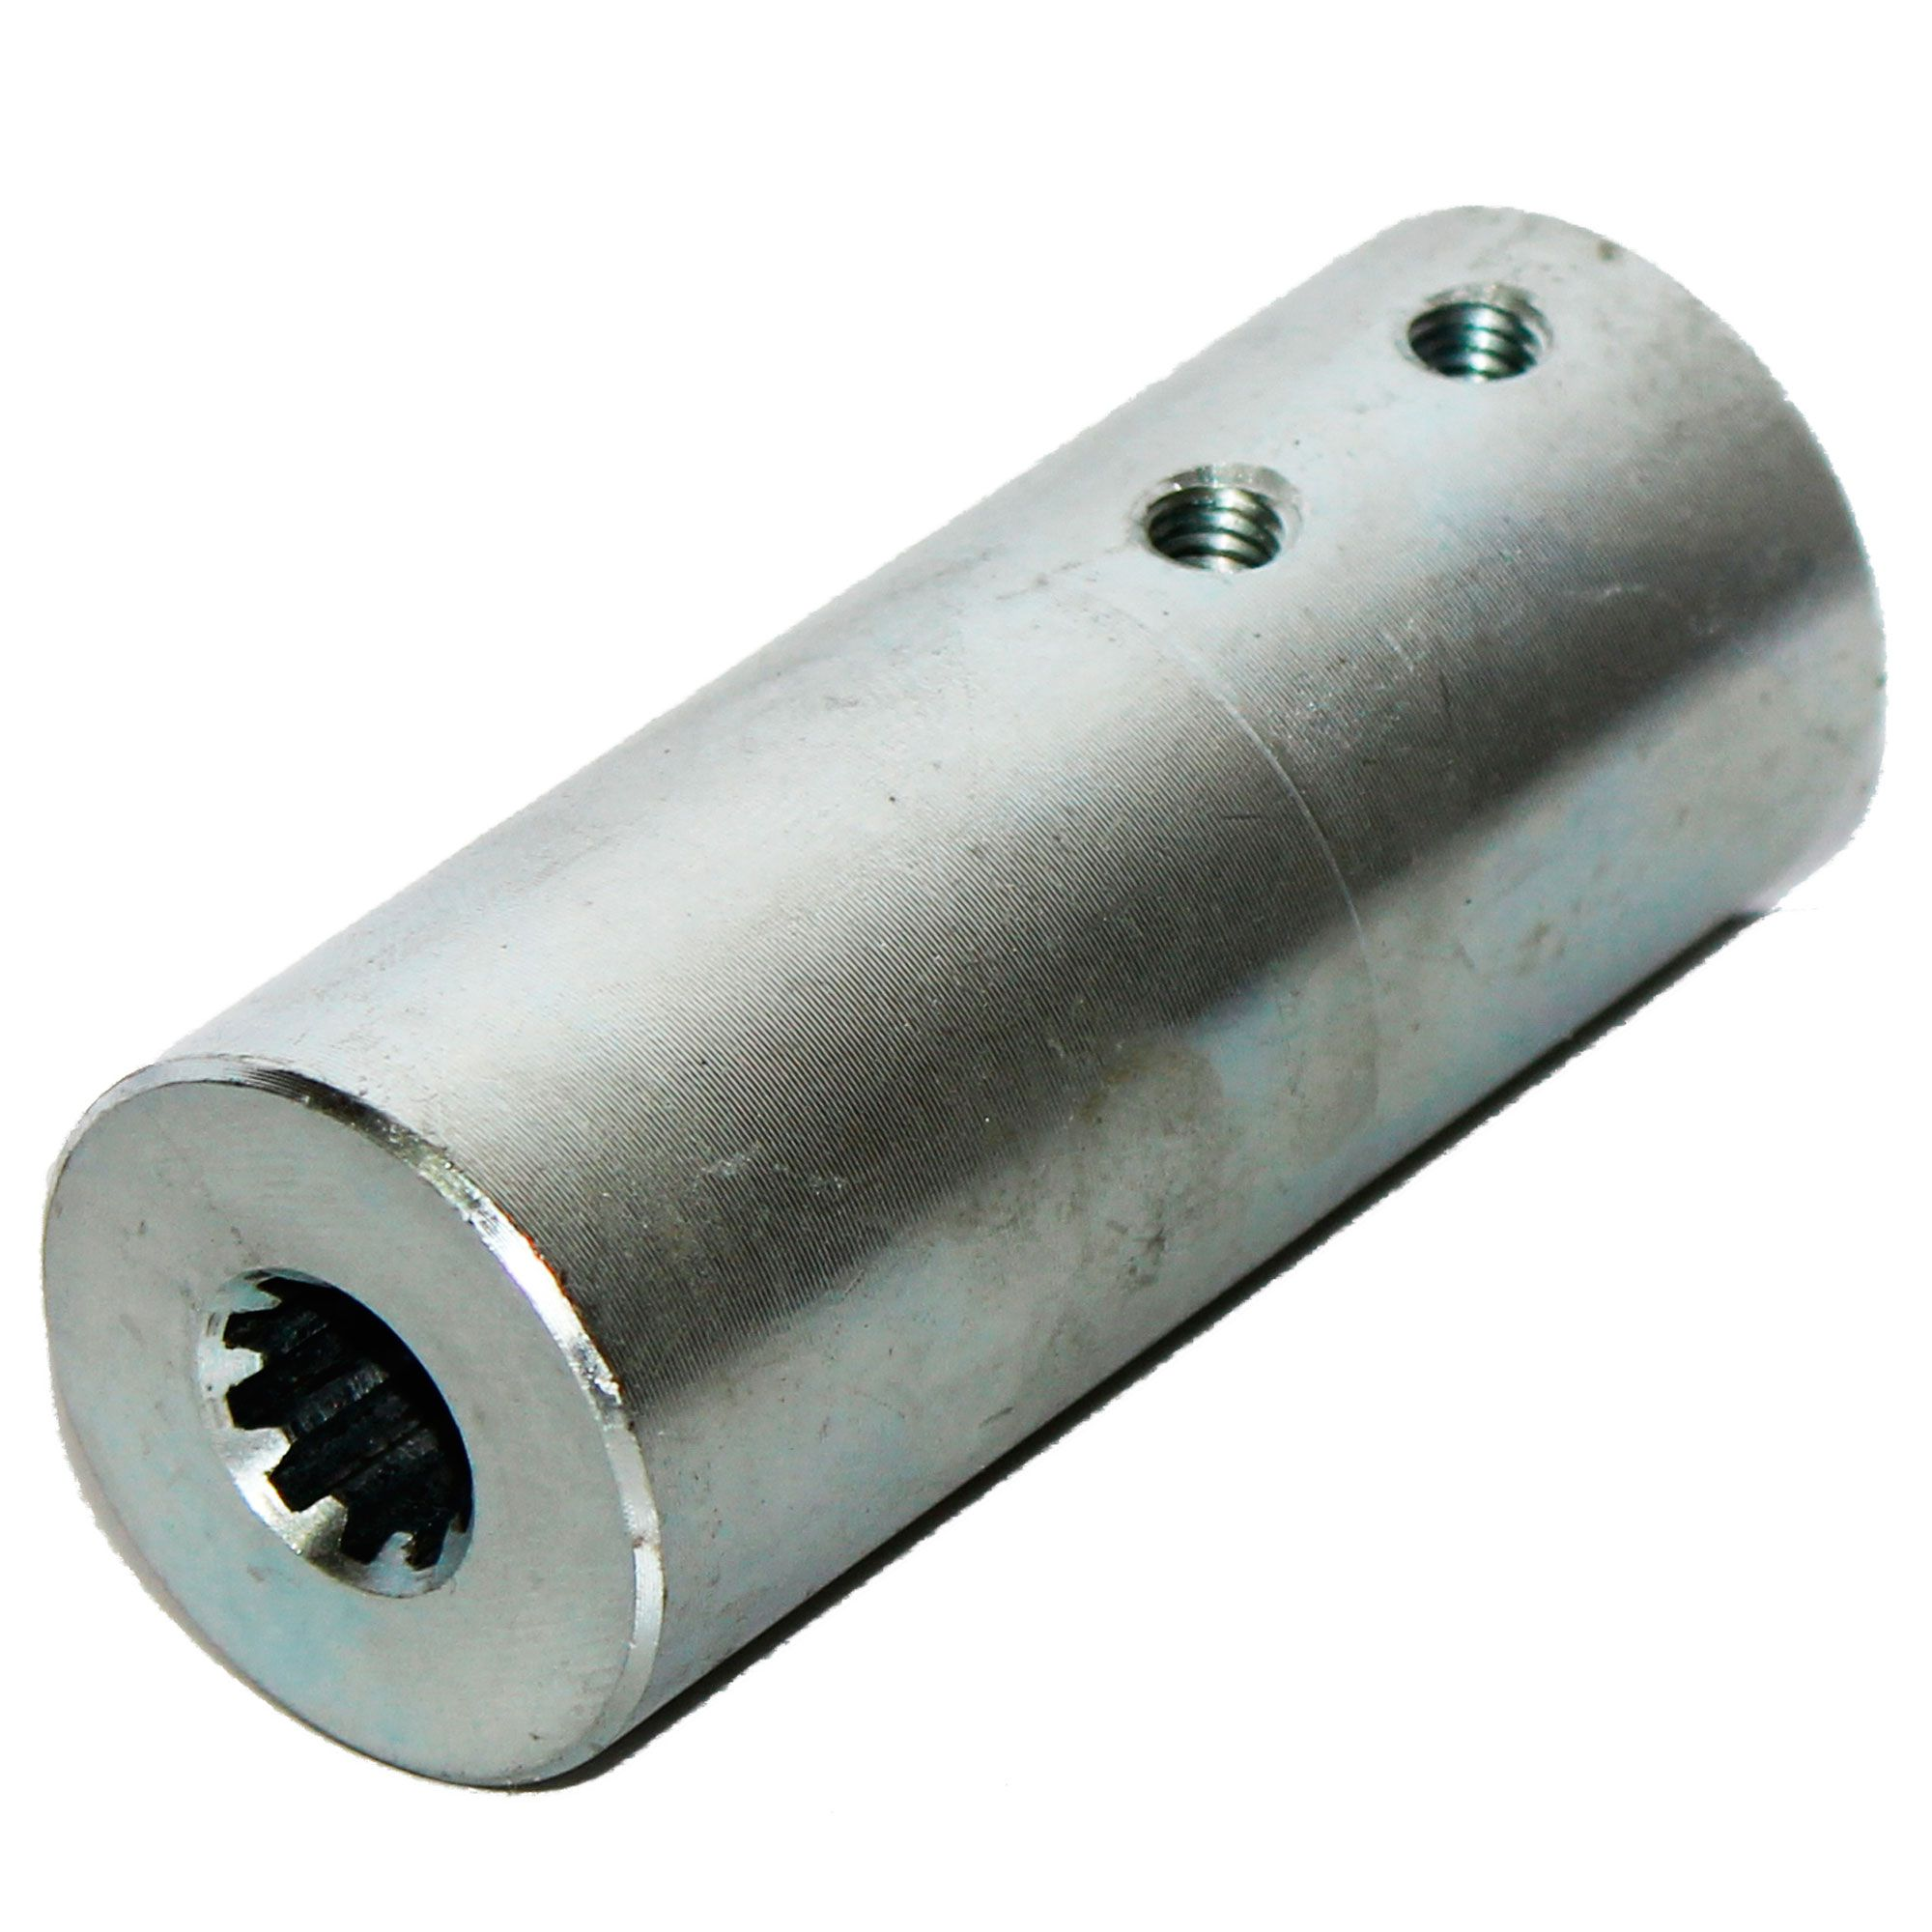 Luva de Acoplamento 19,05mm